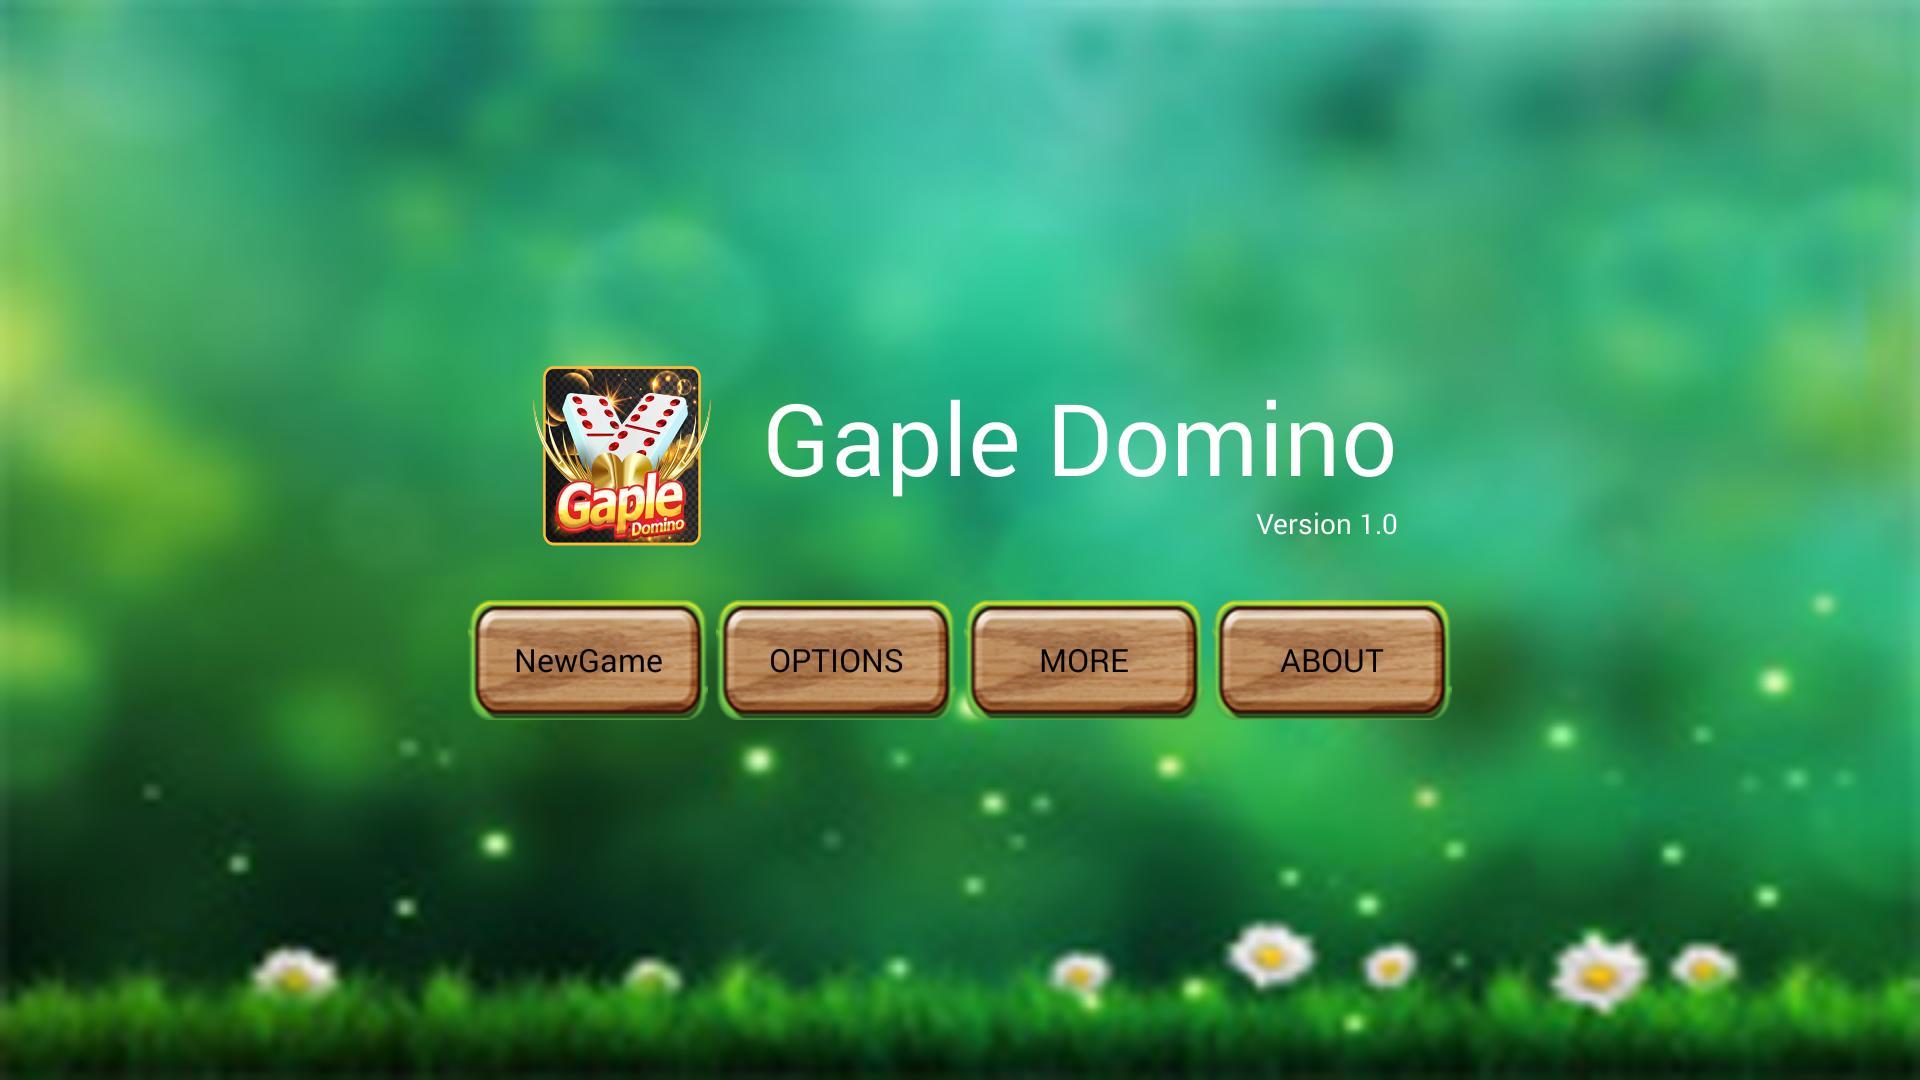 Gaple Domino Offline 2019 Para Android Apk Baixar